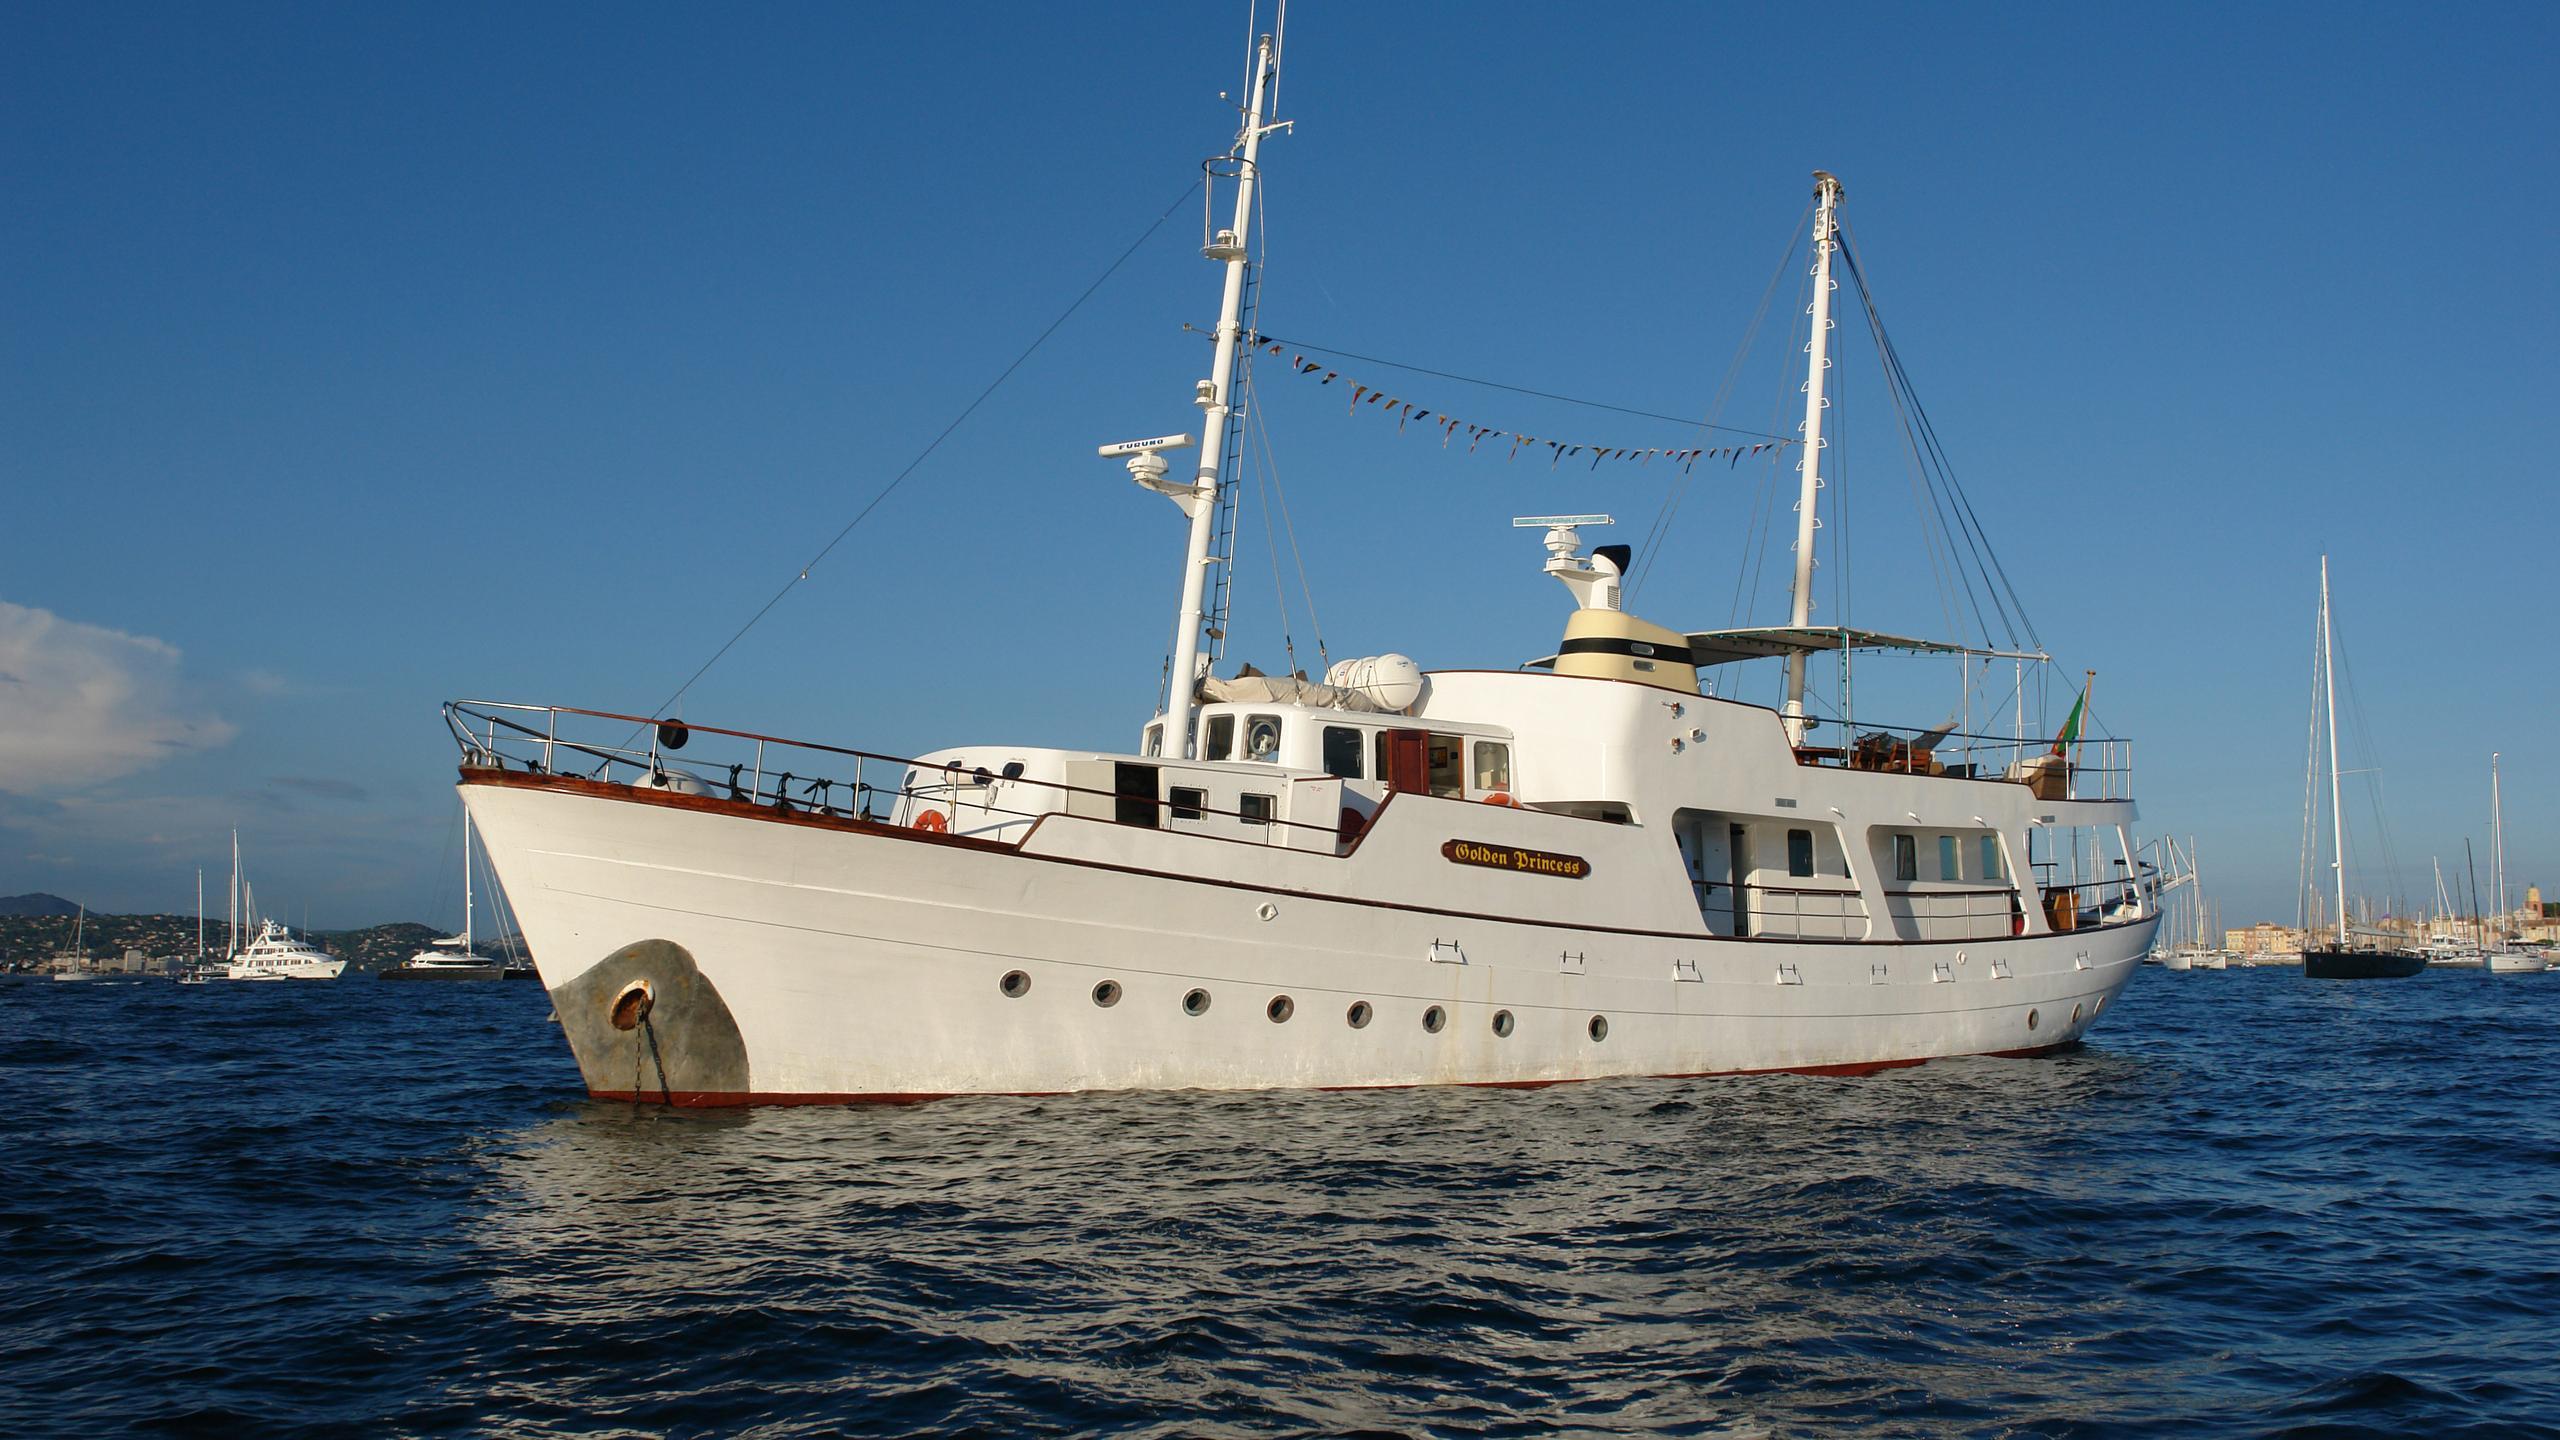 golden-princess-classic-motor-yacht-normandie-1966-26m-half-profile